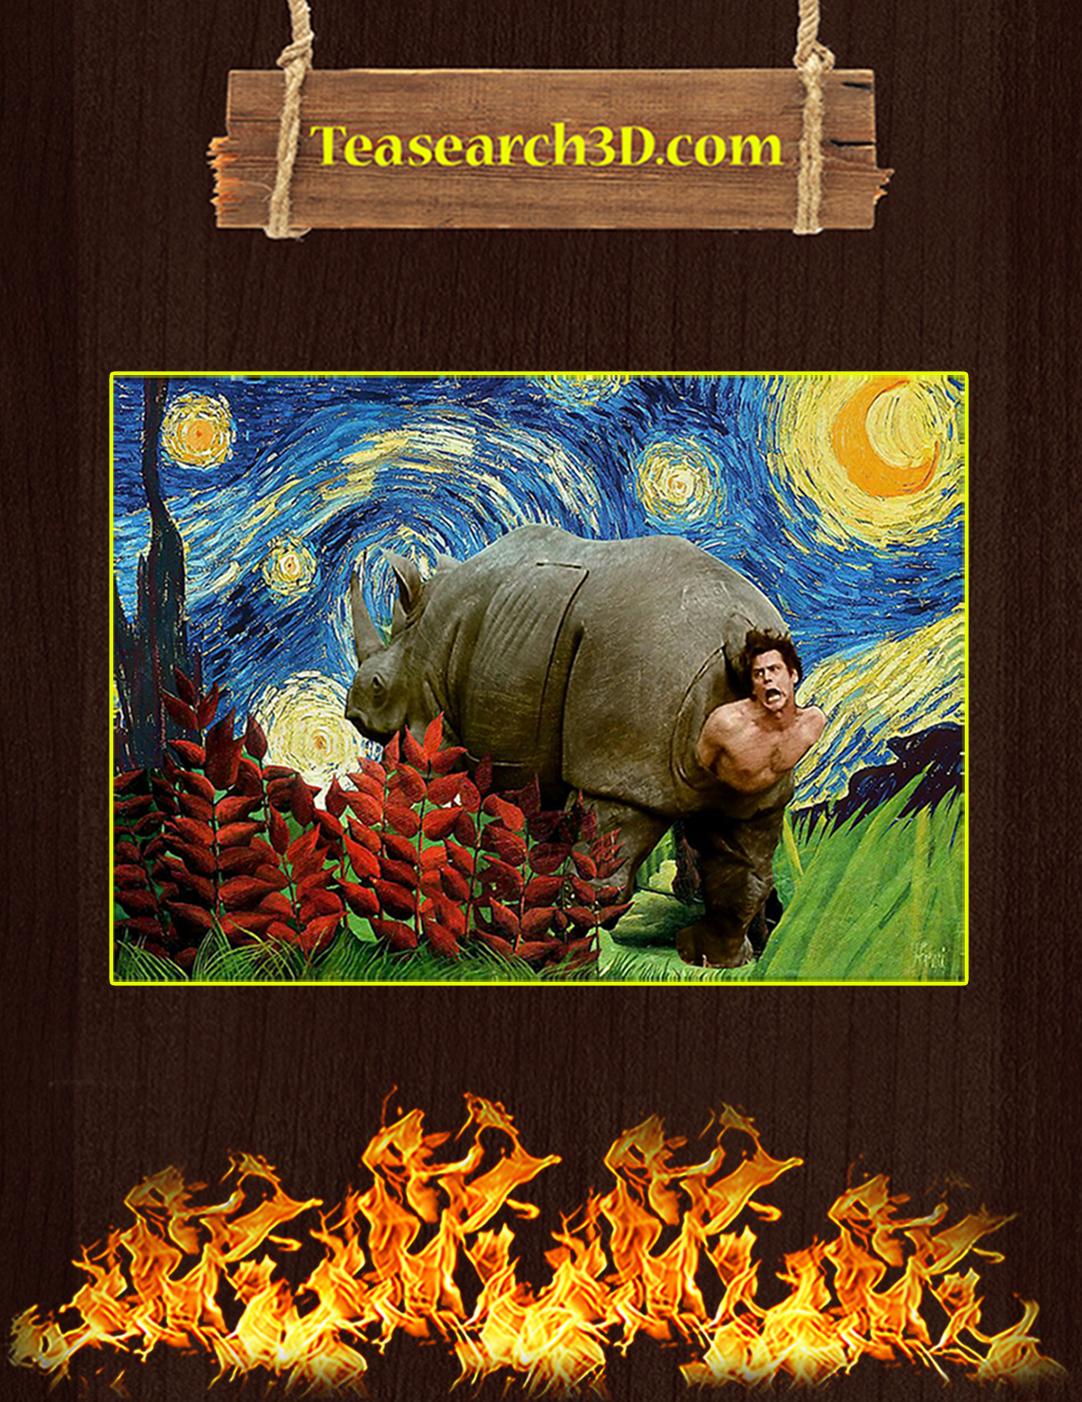 Rhino scene ace ventura starry night poster A2